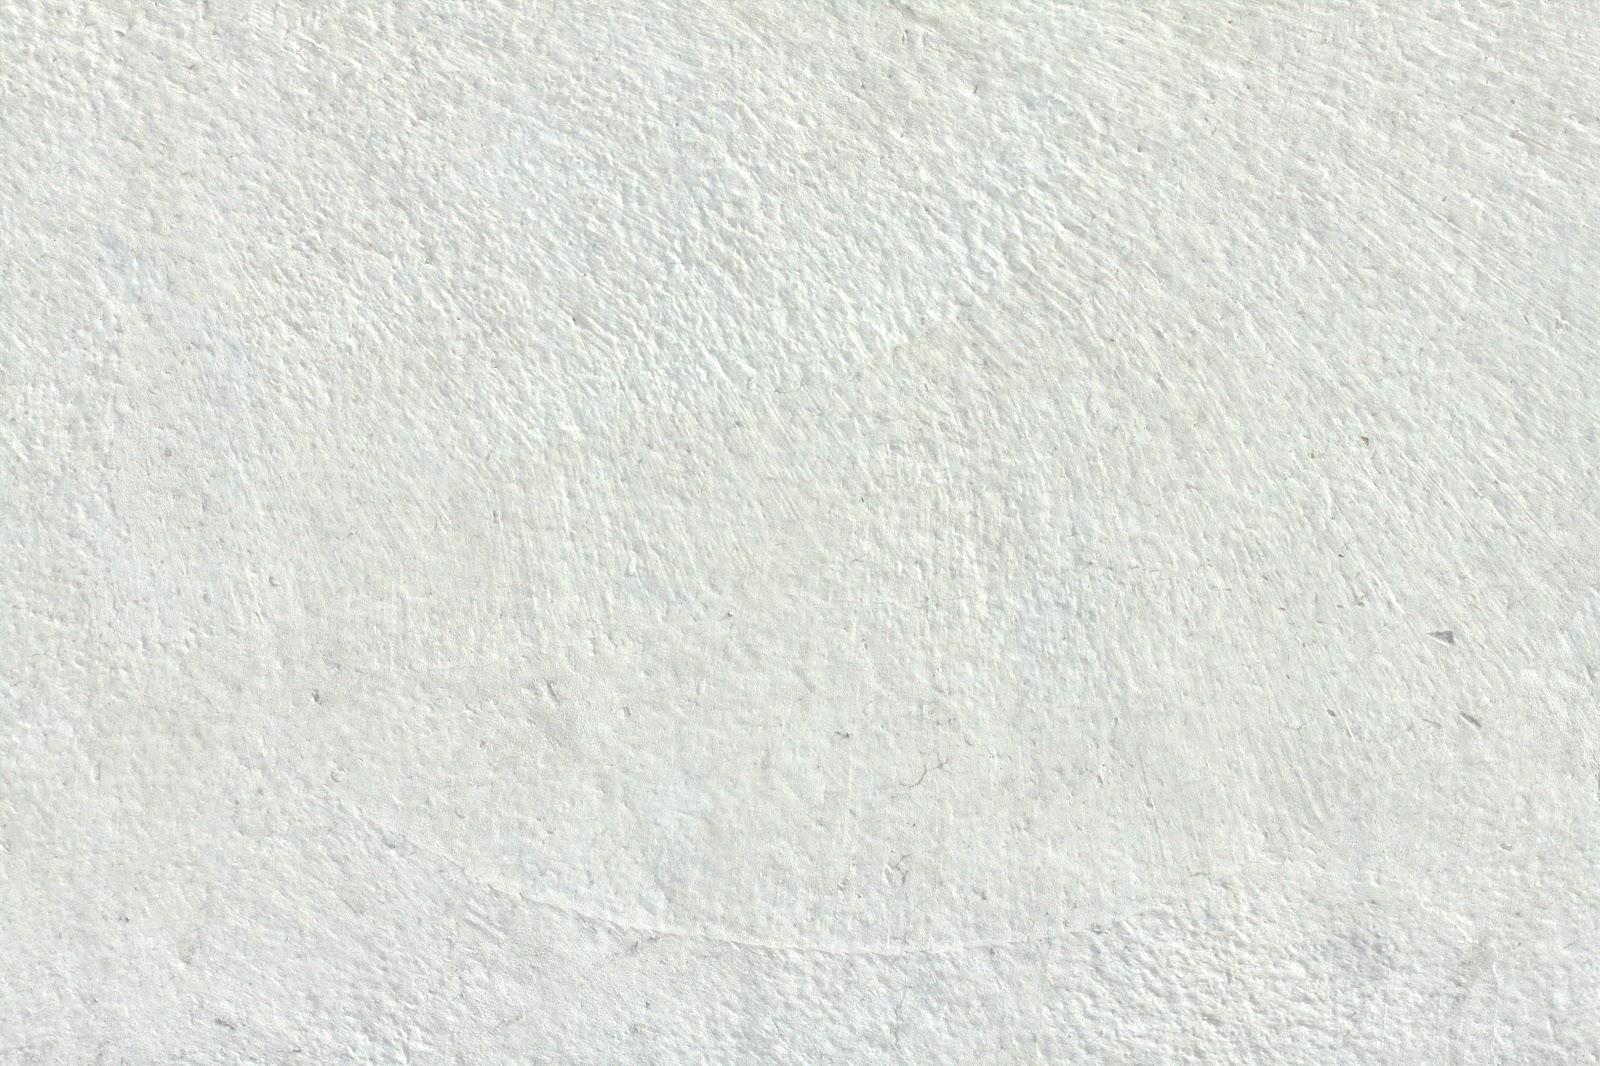 High Resolution Seamless Textures October